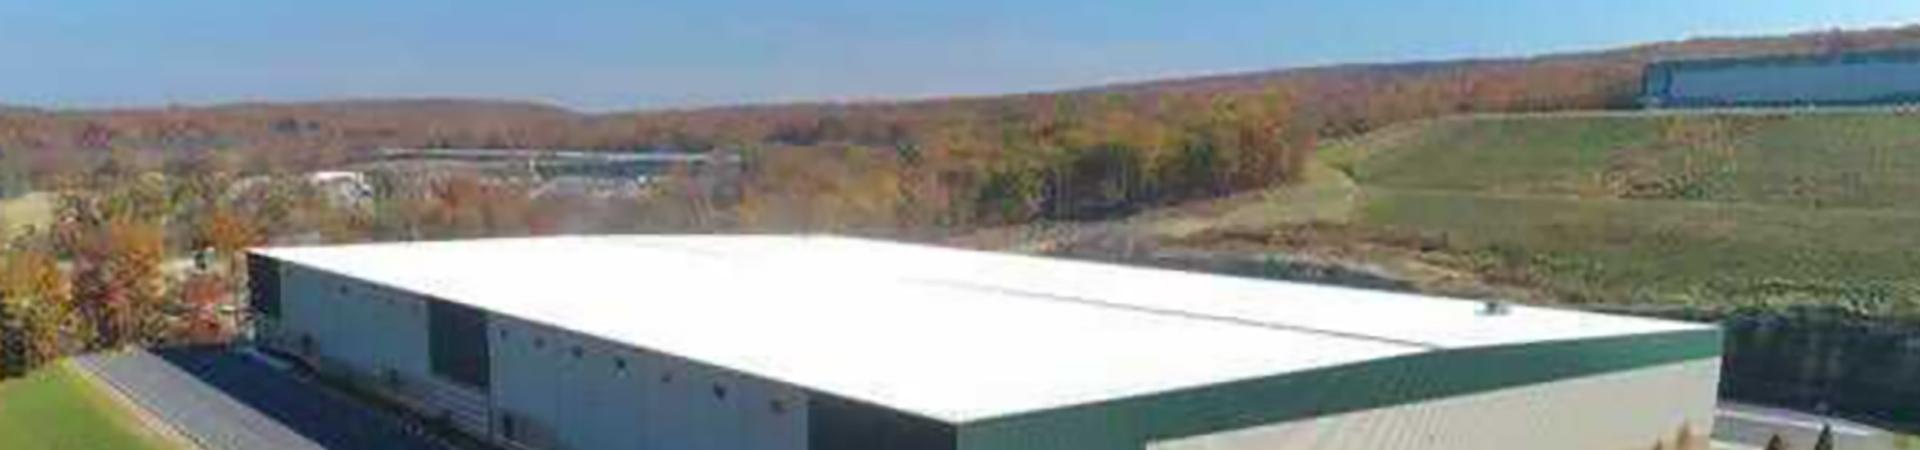 Pittson, PA fulfillment center